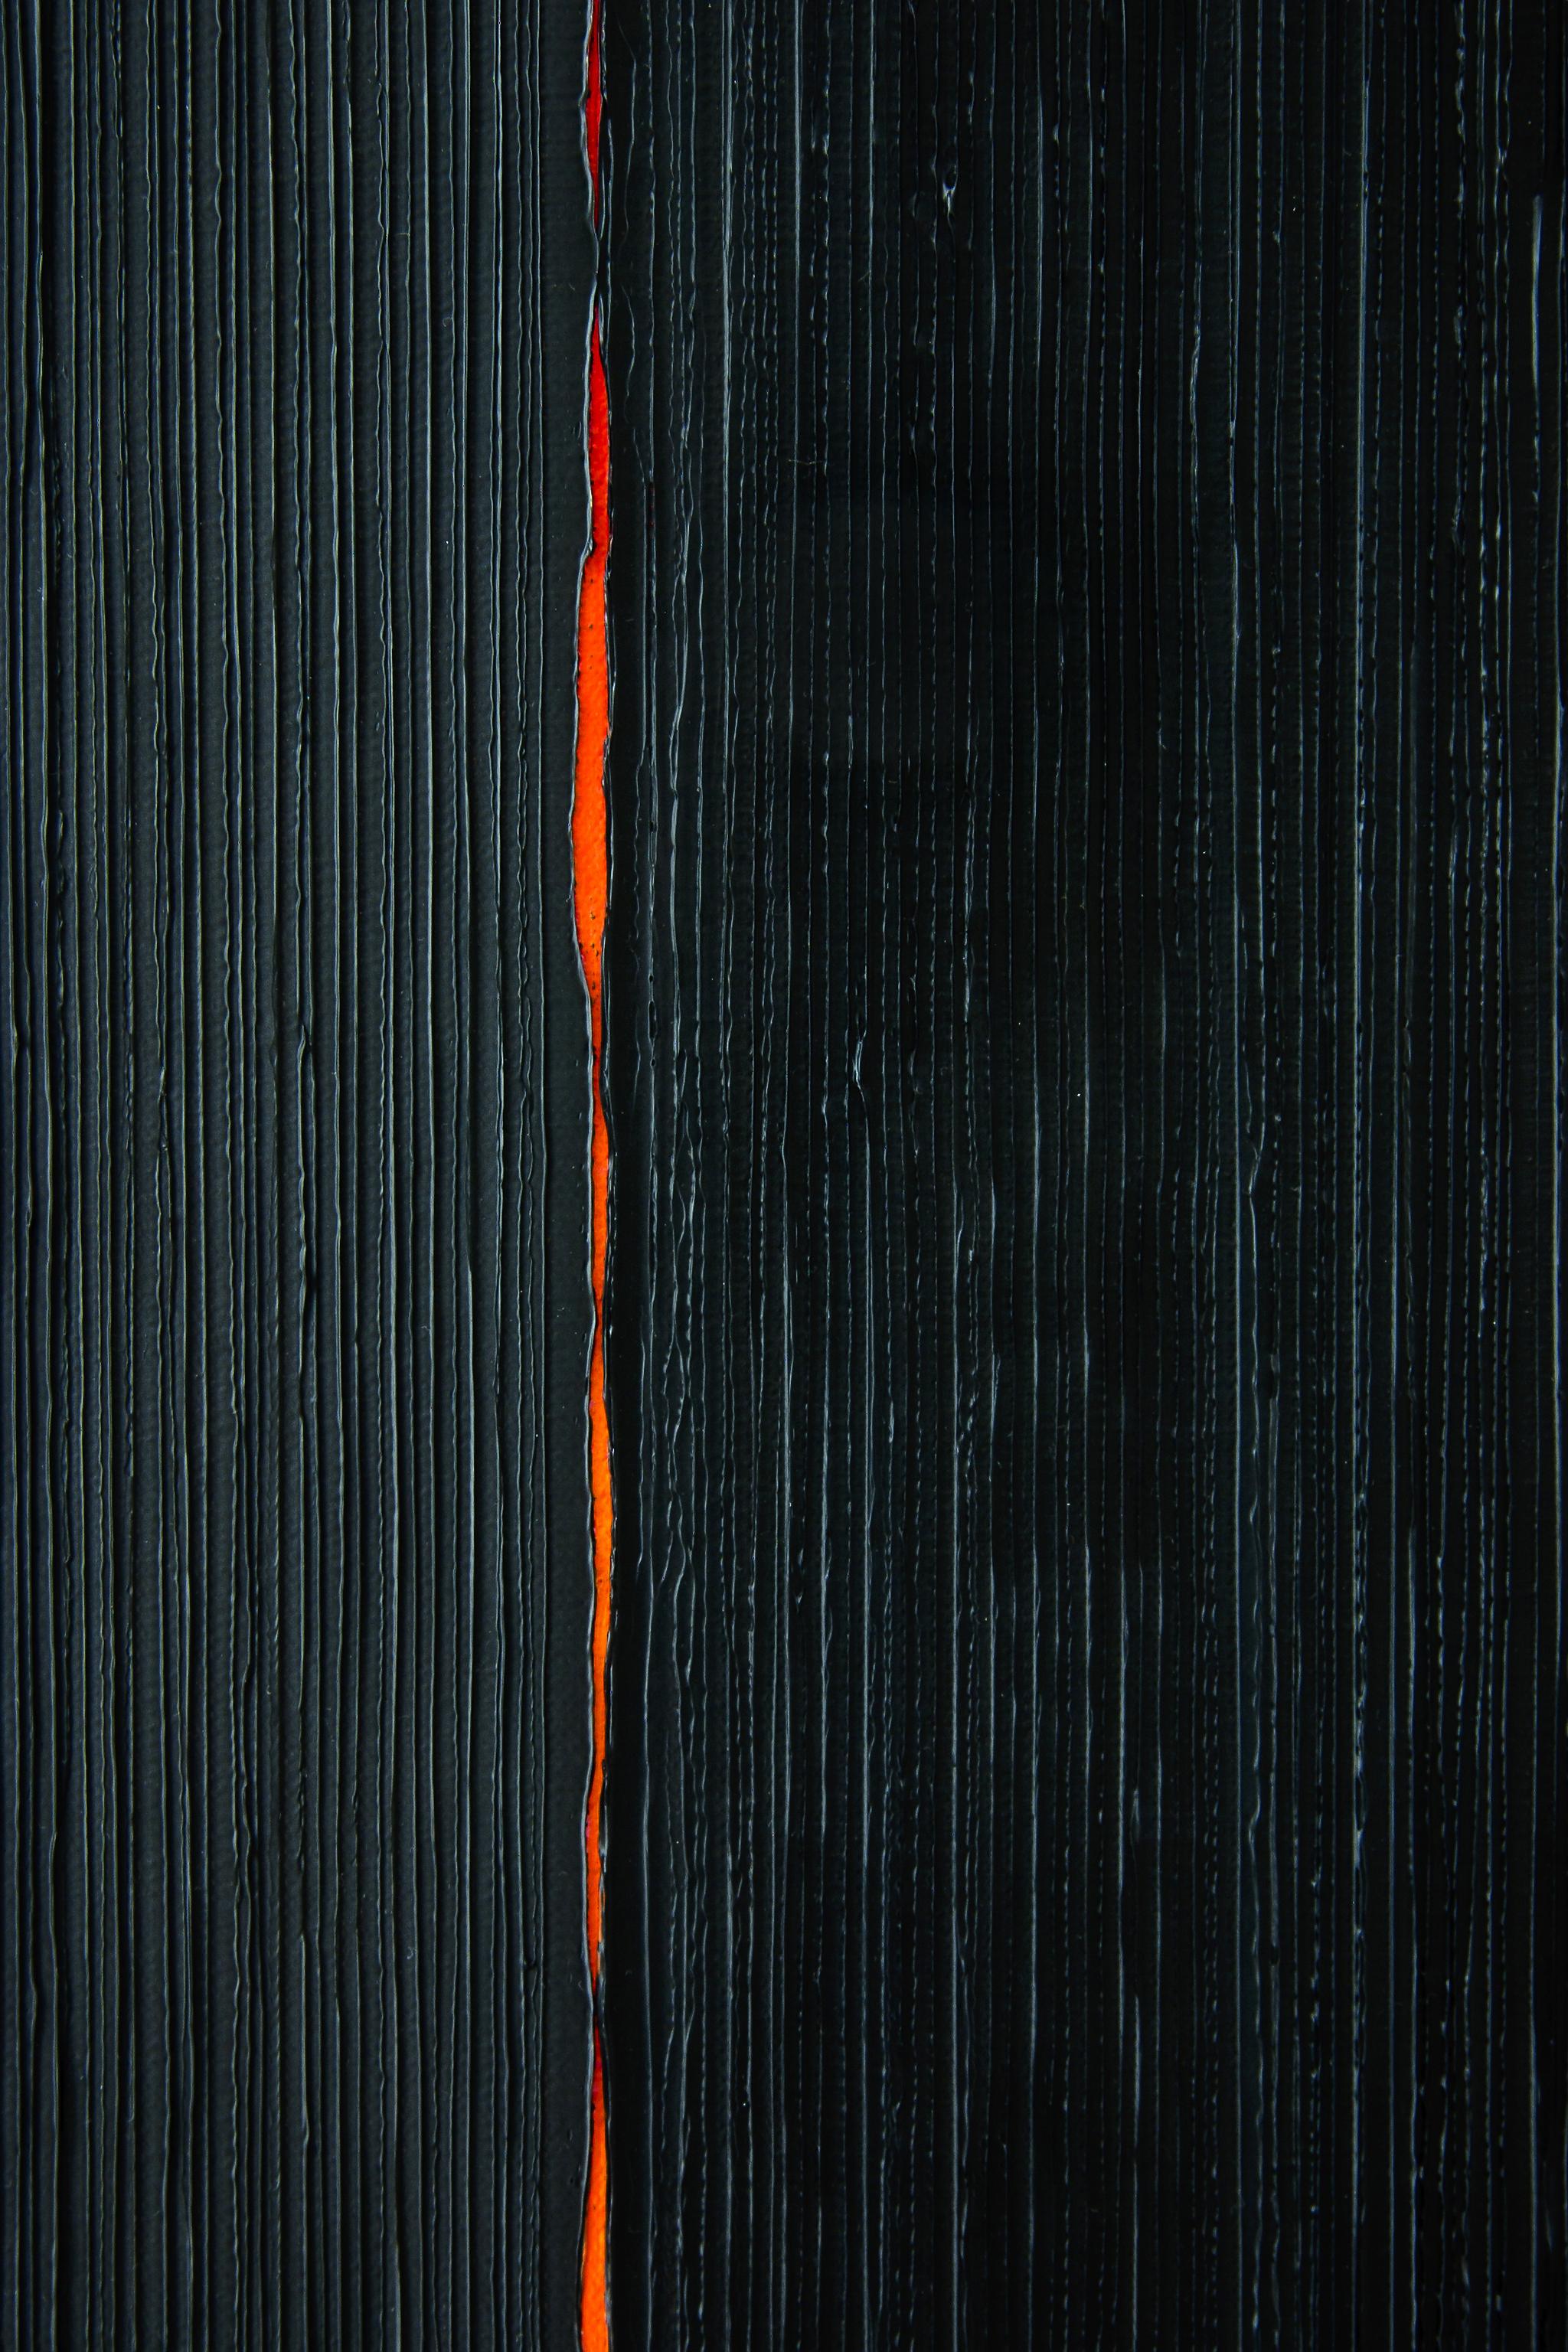 Moes_Galerie_Zavodny.jpg